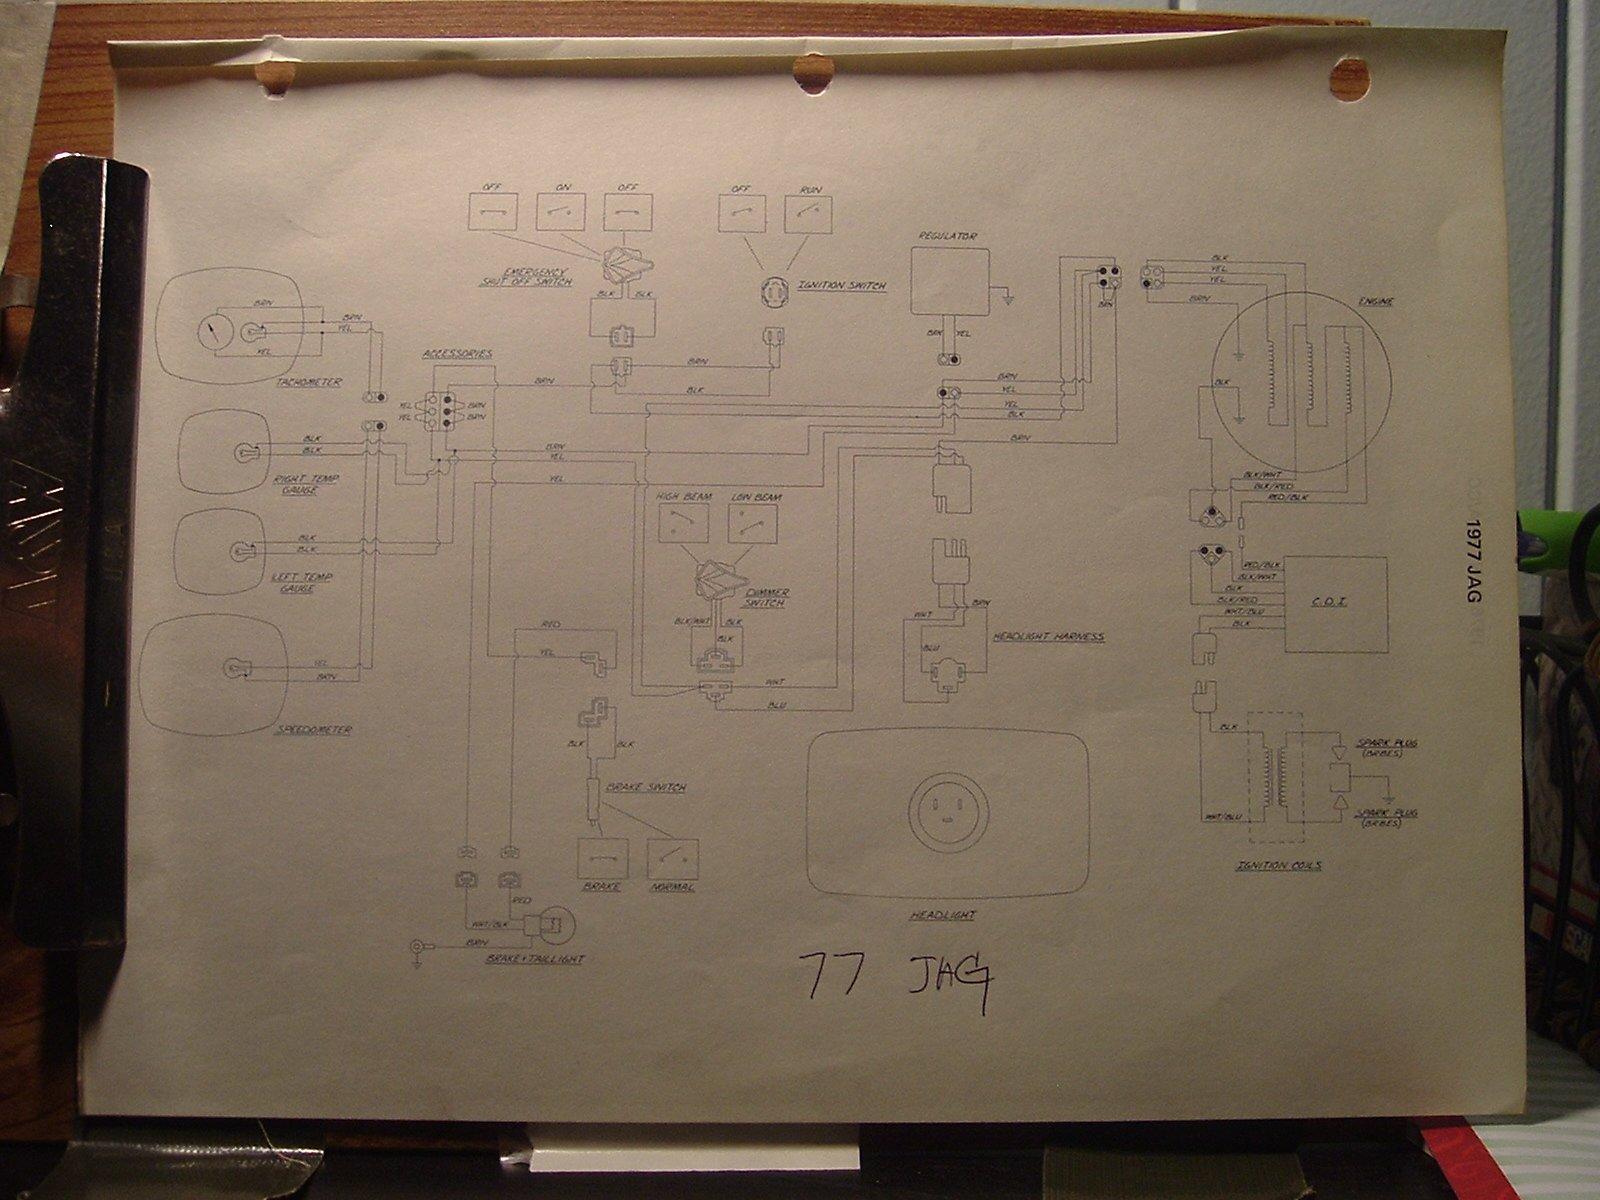 1980 Jag electrical Diagram   Arctic Cat ForumArctic Chat